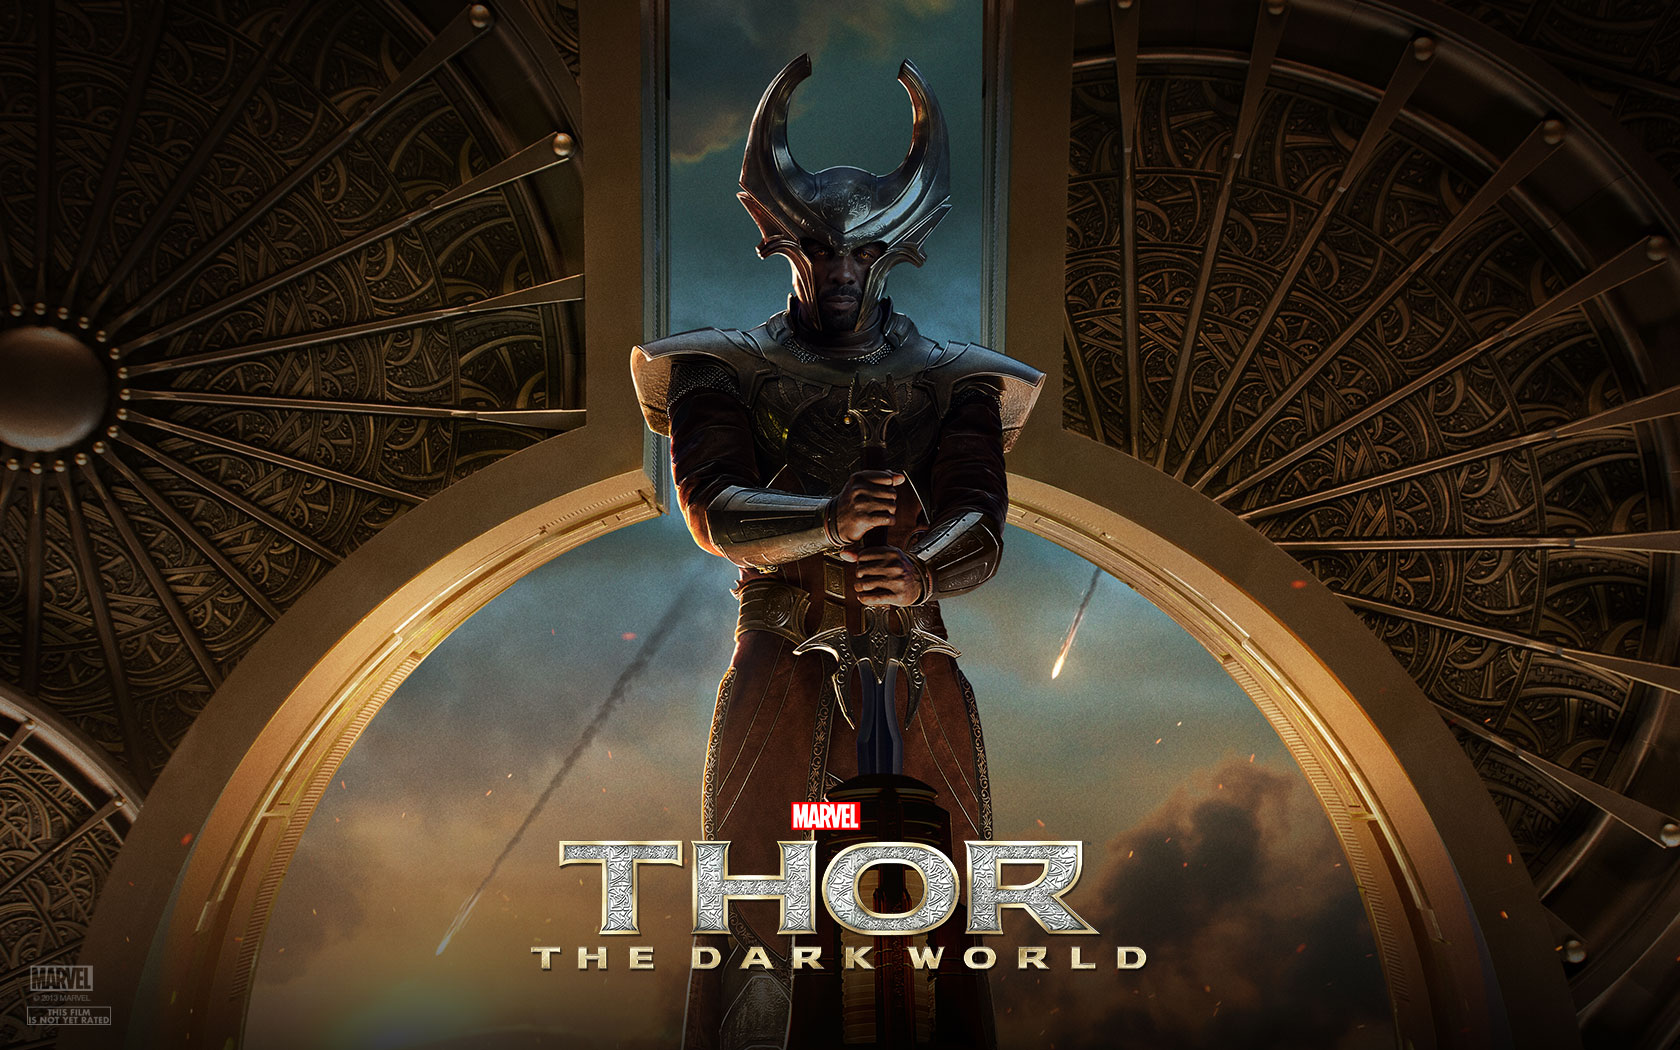 Thor The Dark World wallpaper 16